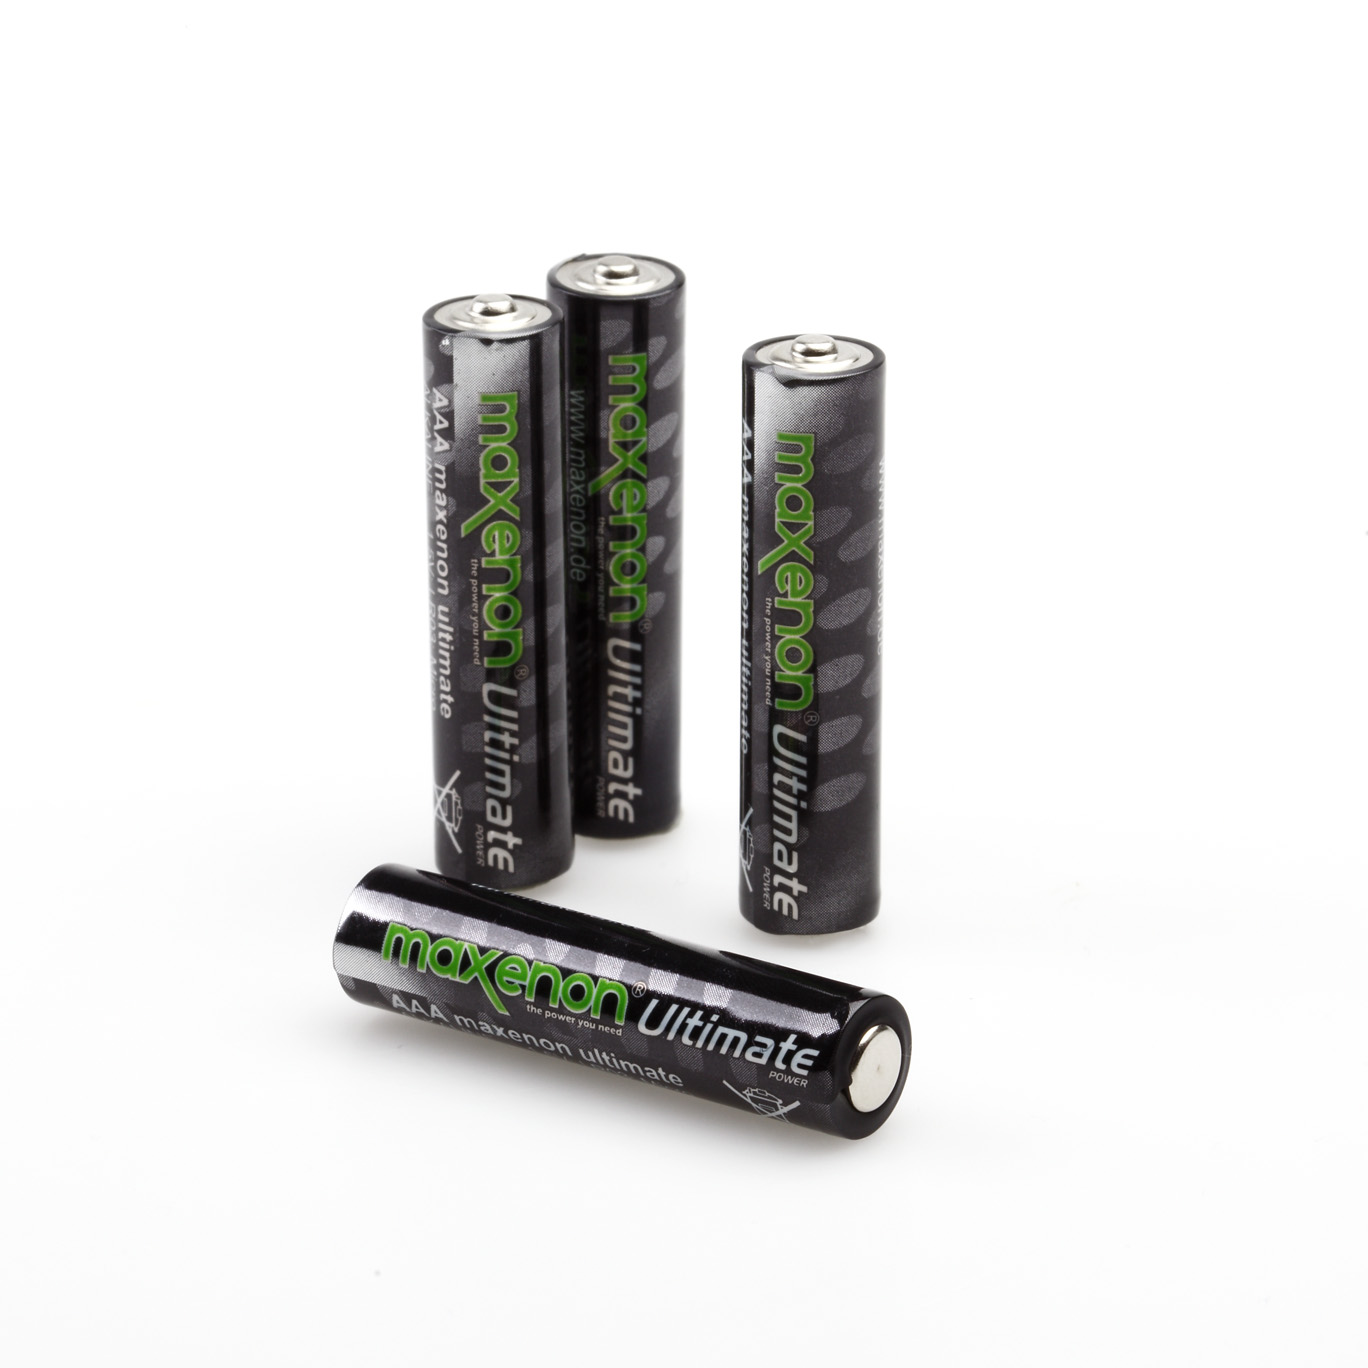 Dusche Keller Hebeanlage : Lampe F?r Dusche Batterie : Maxenon Lampenzubeh?r ? 3 AAA Batterie